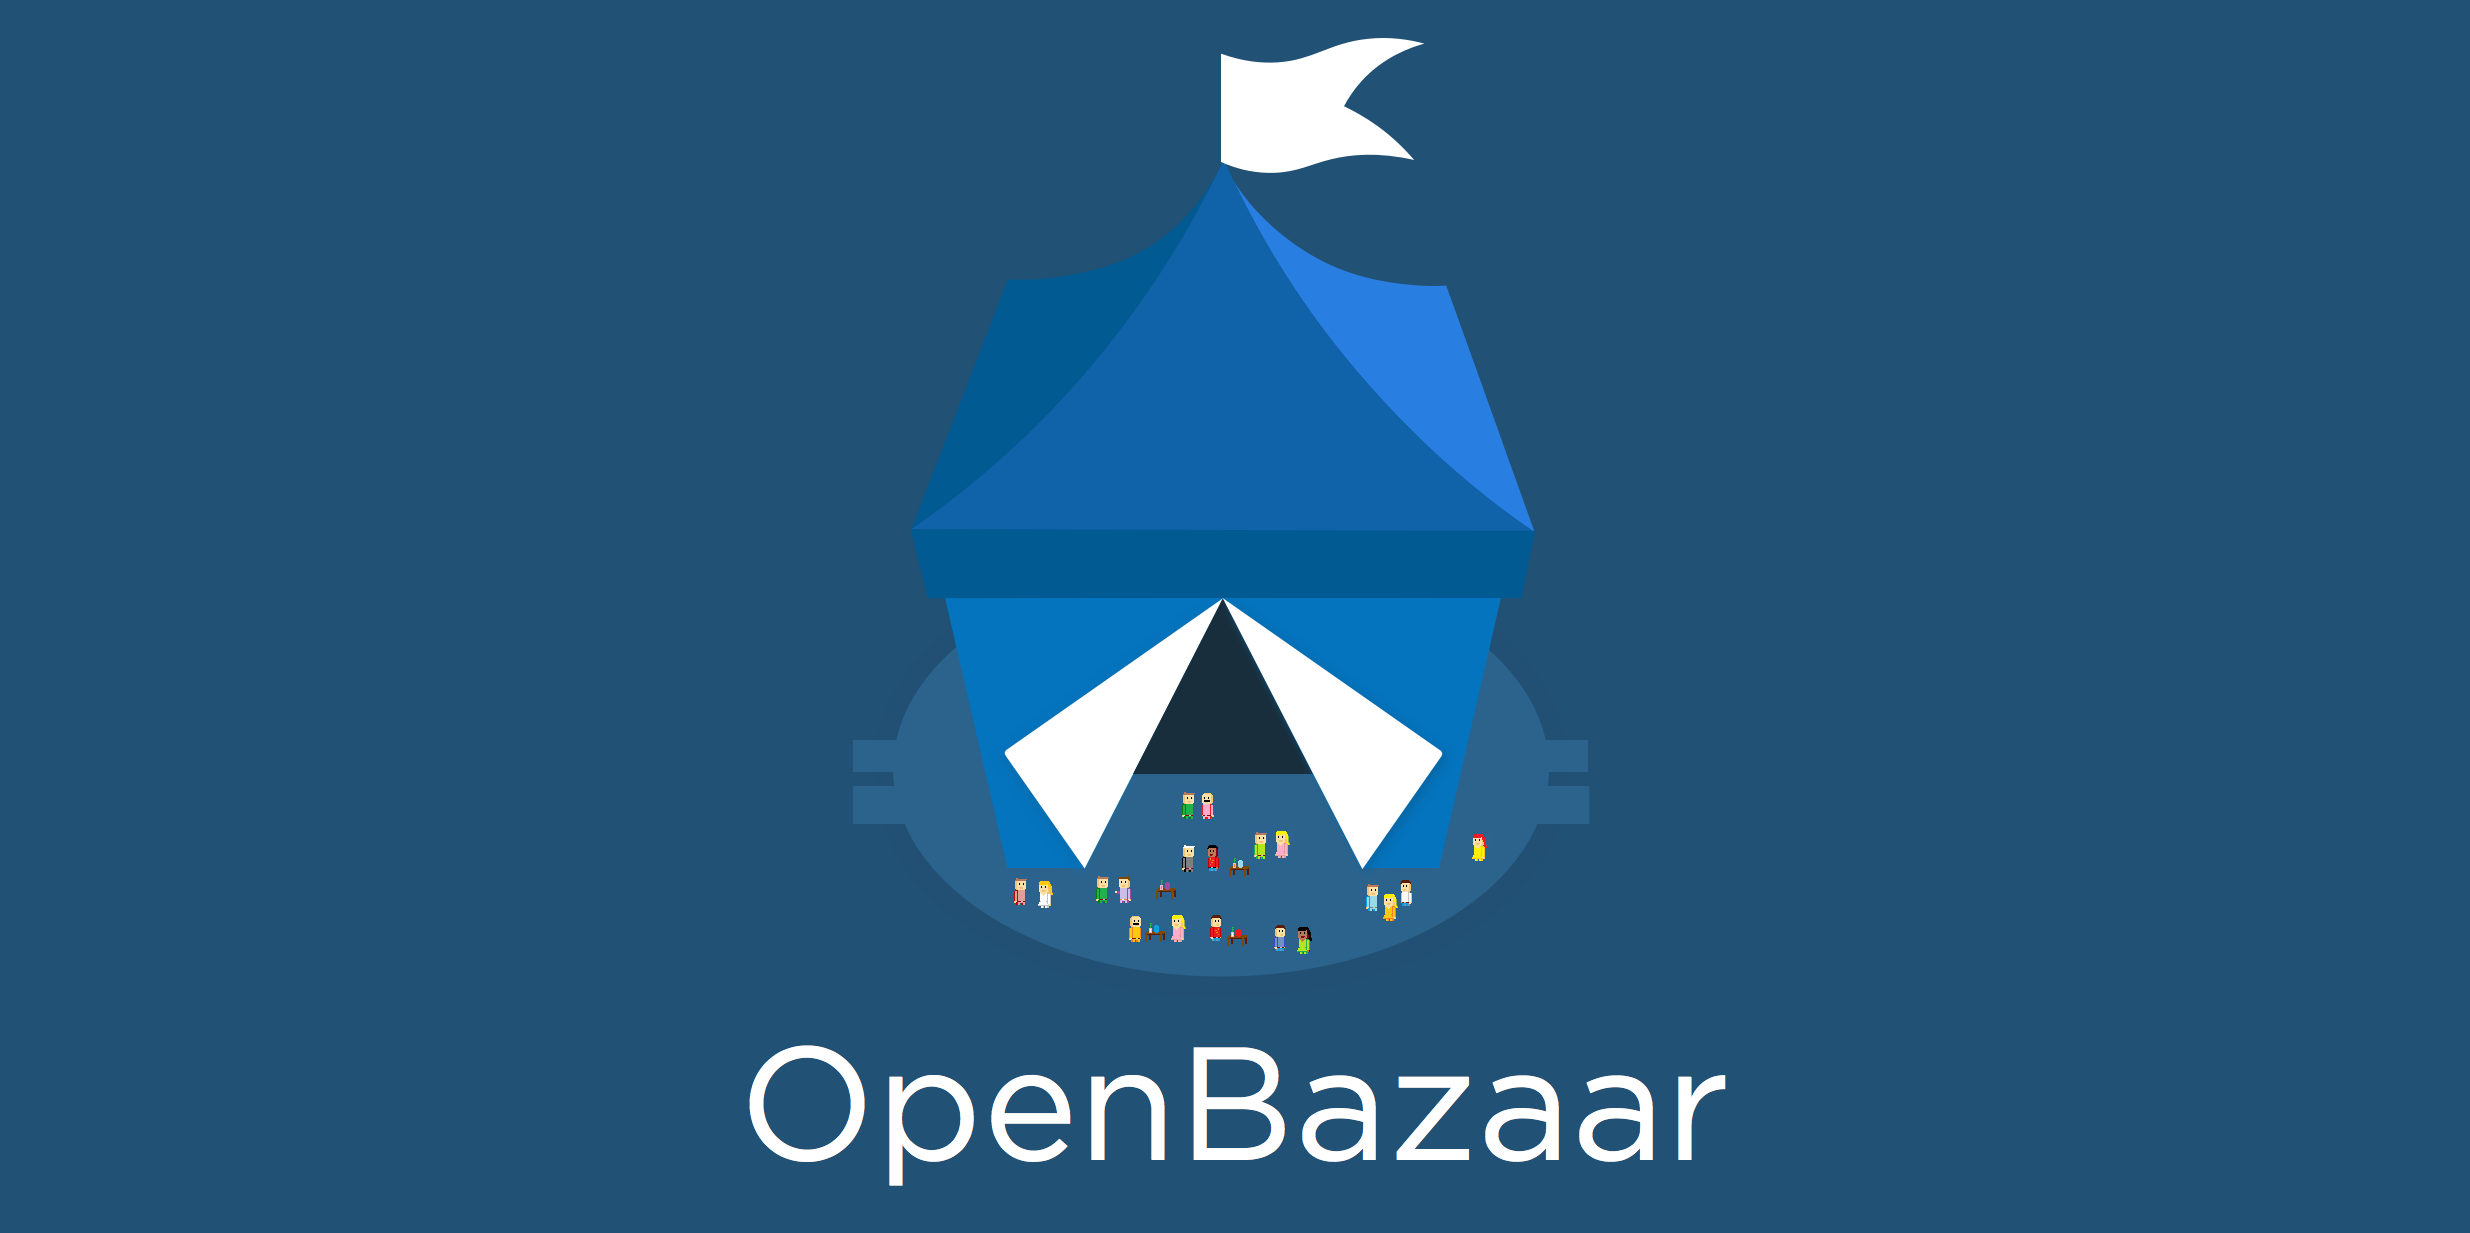 Openbazaar 2.0, varianta Beta, vine cu implementare pe Tor, magazin offline, Shapeshift și Segwit